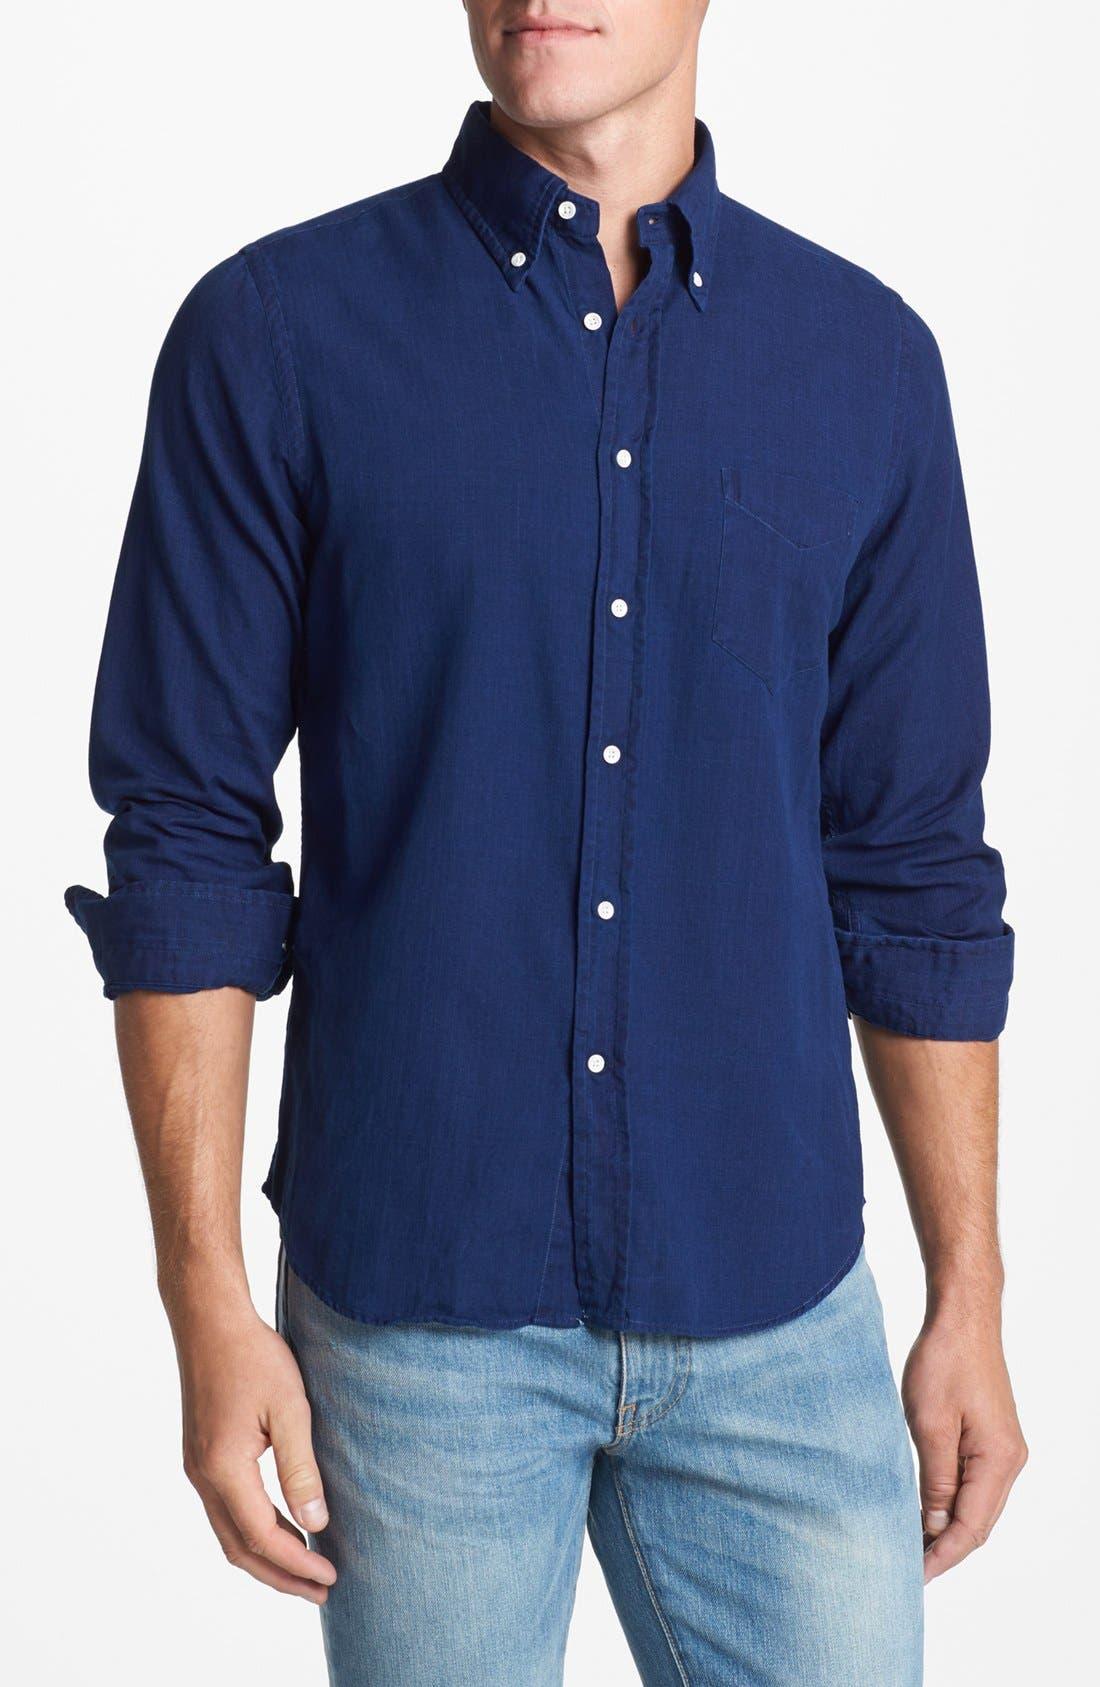 Alternate Image 1 Selected - Gant Rugger Indigo Oxford Shirt